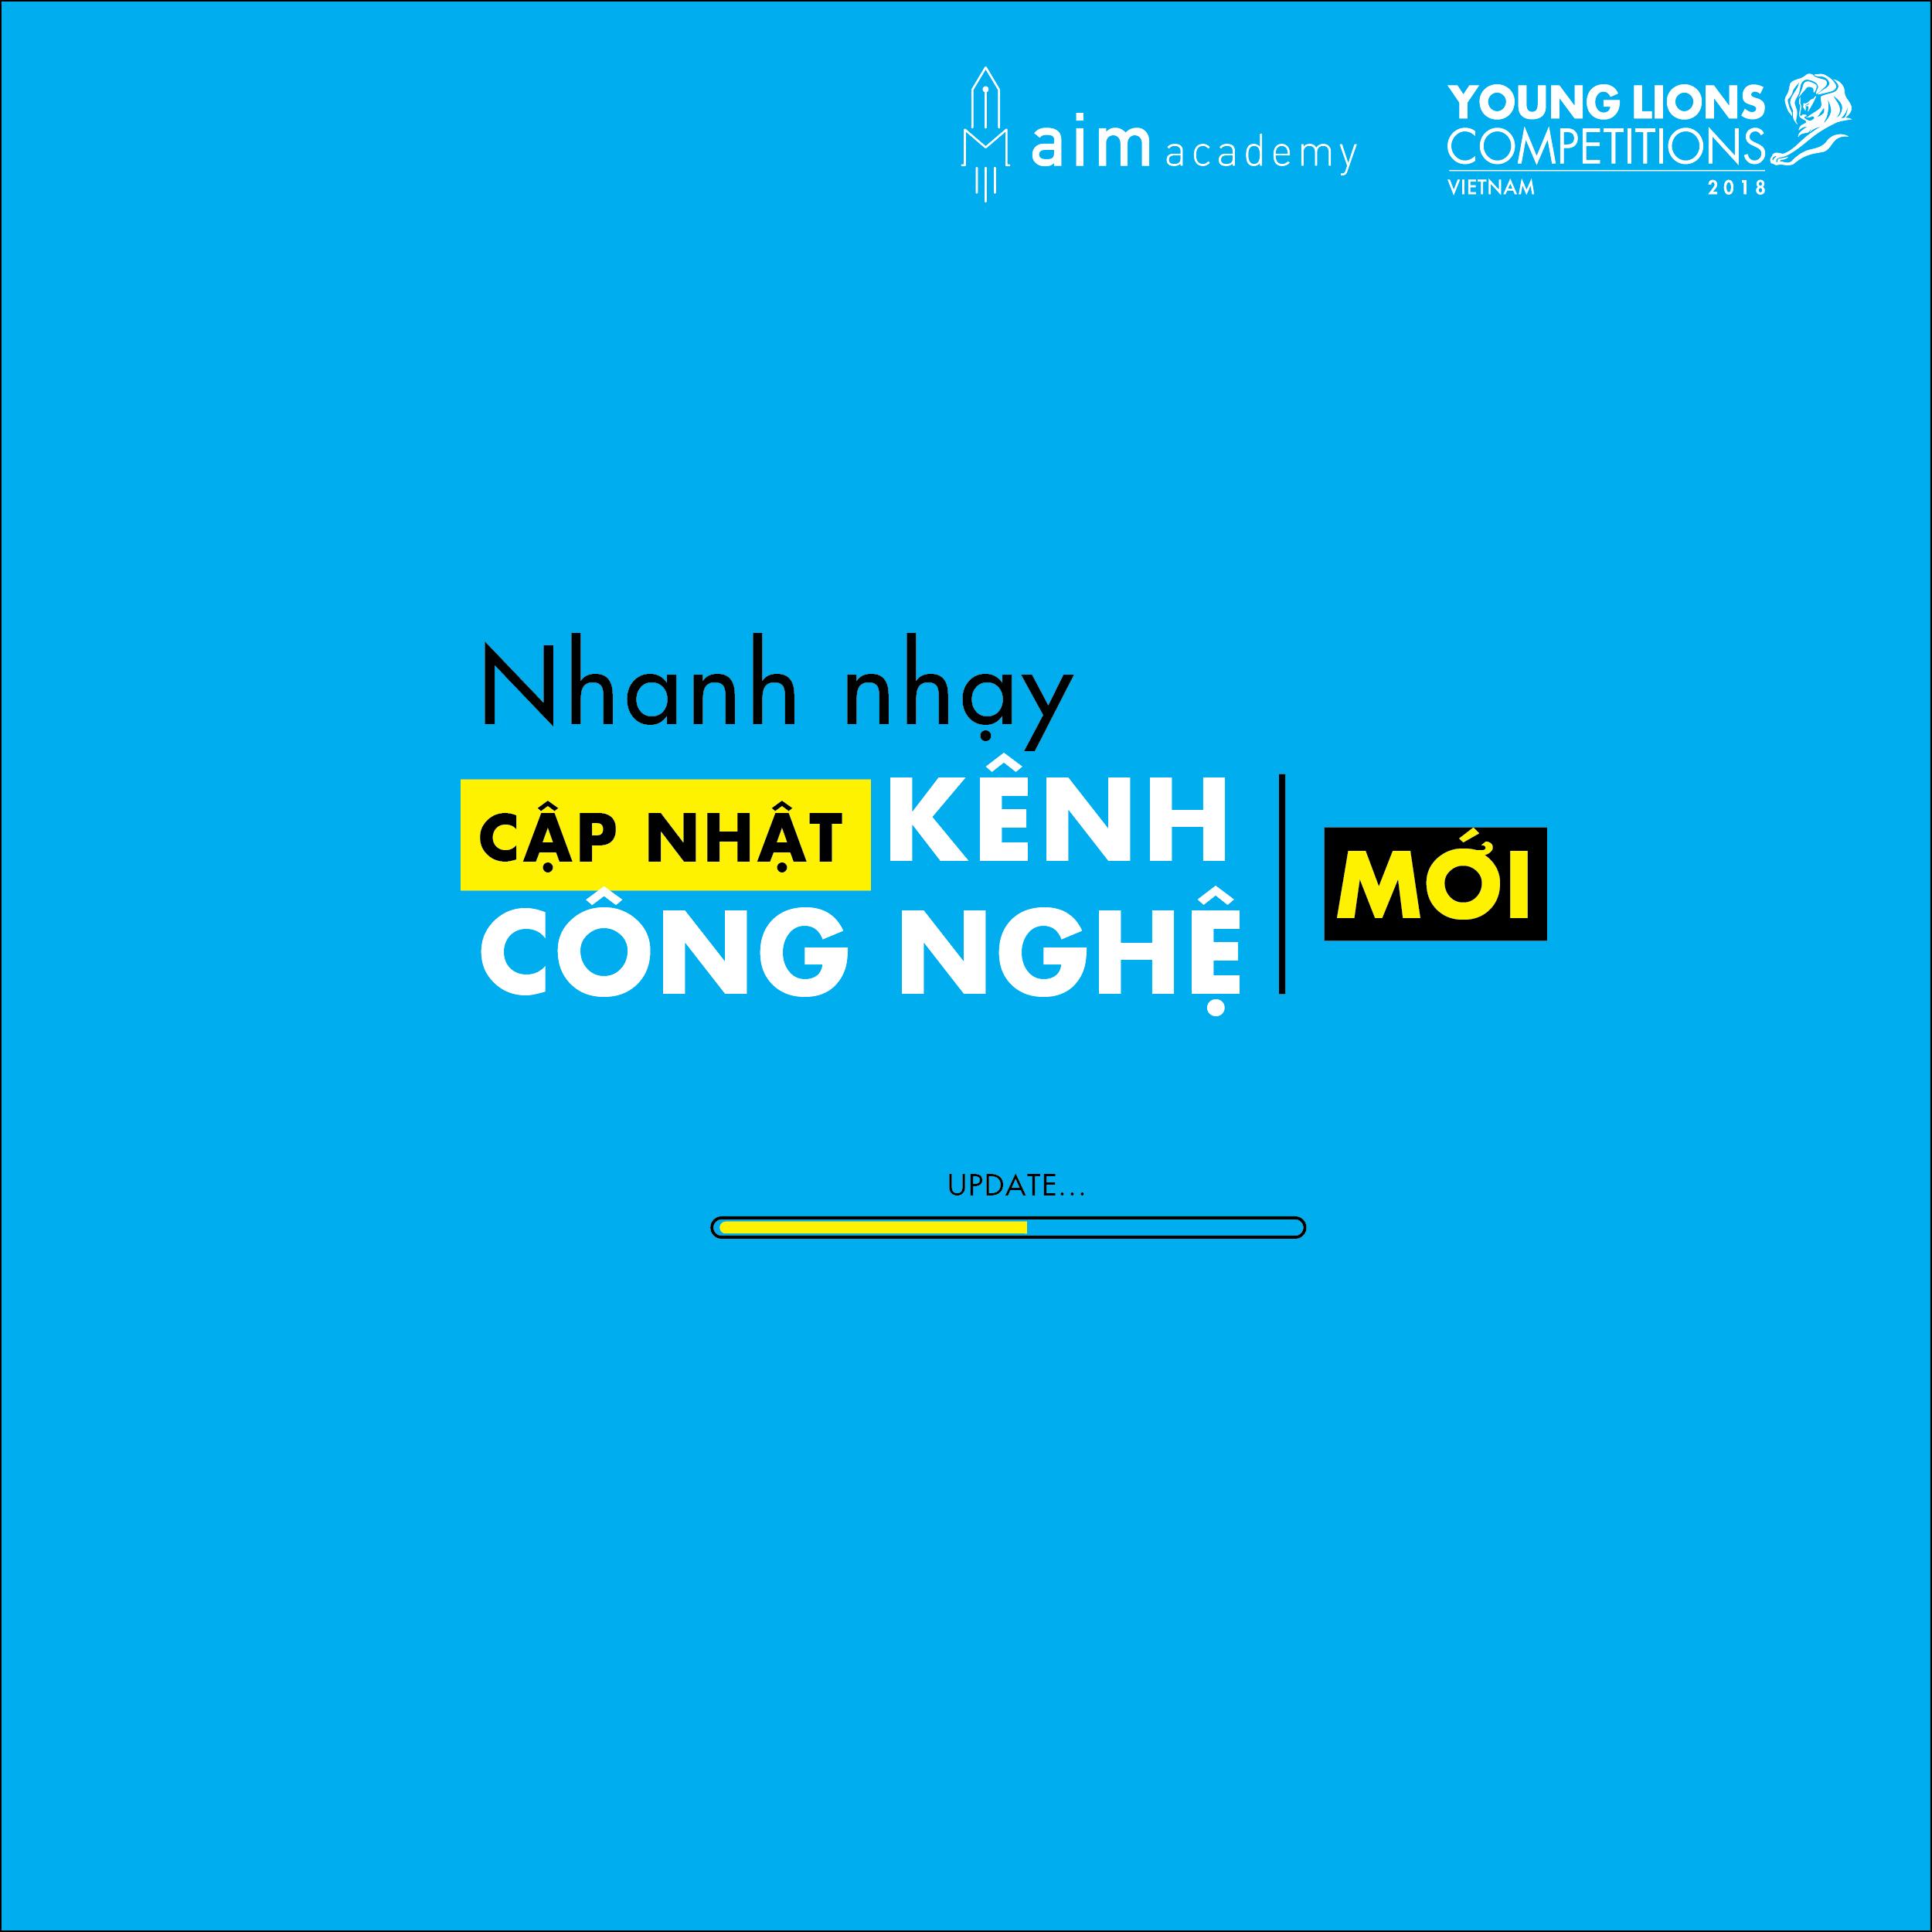 rgb_creative_ideas_vietnam_young_lions_2018_c6_3_3-01